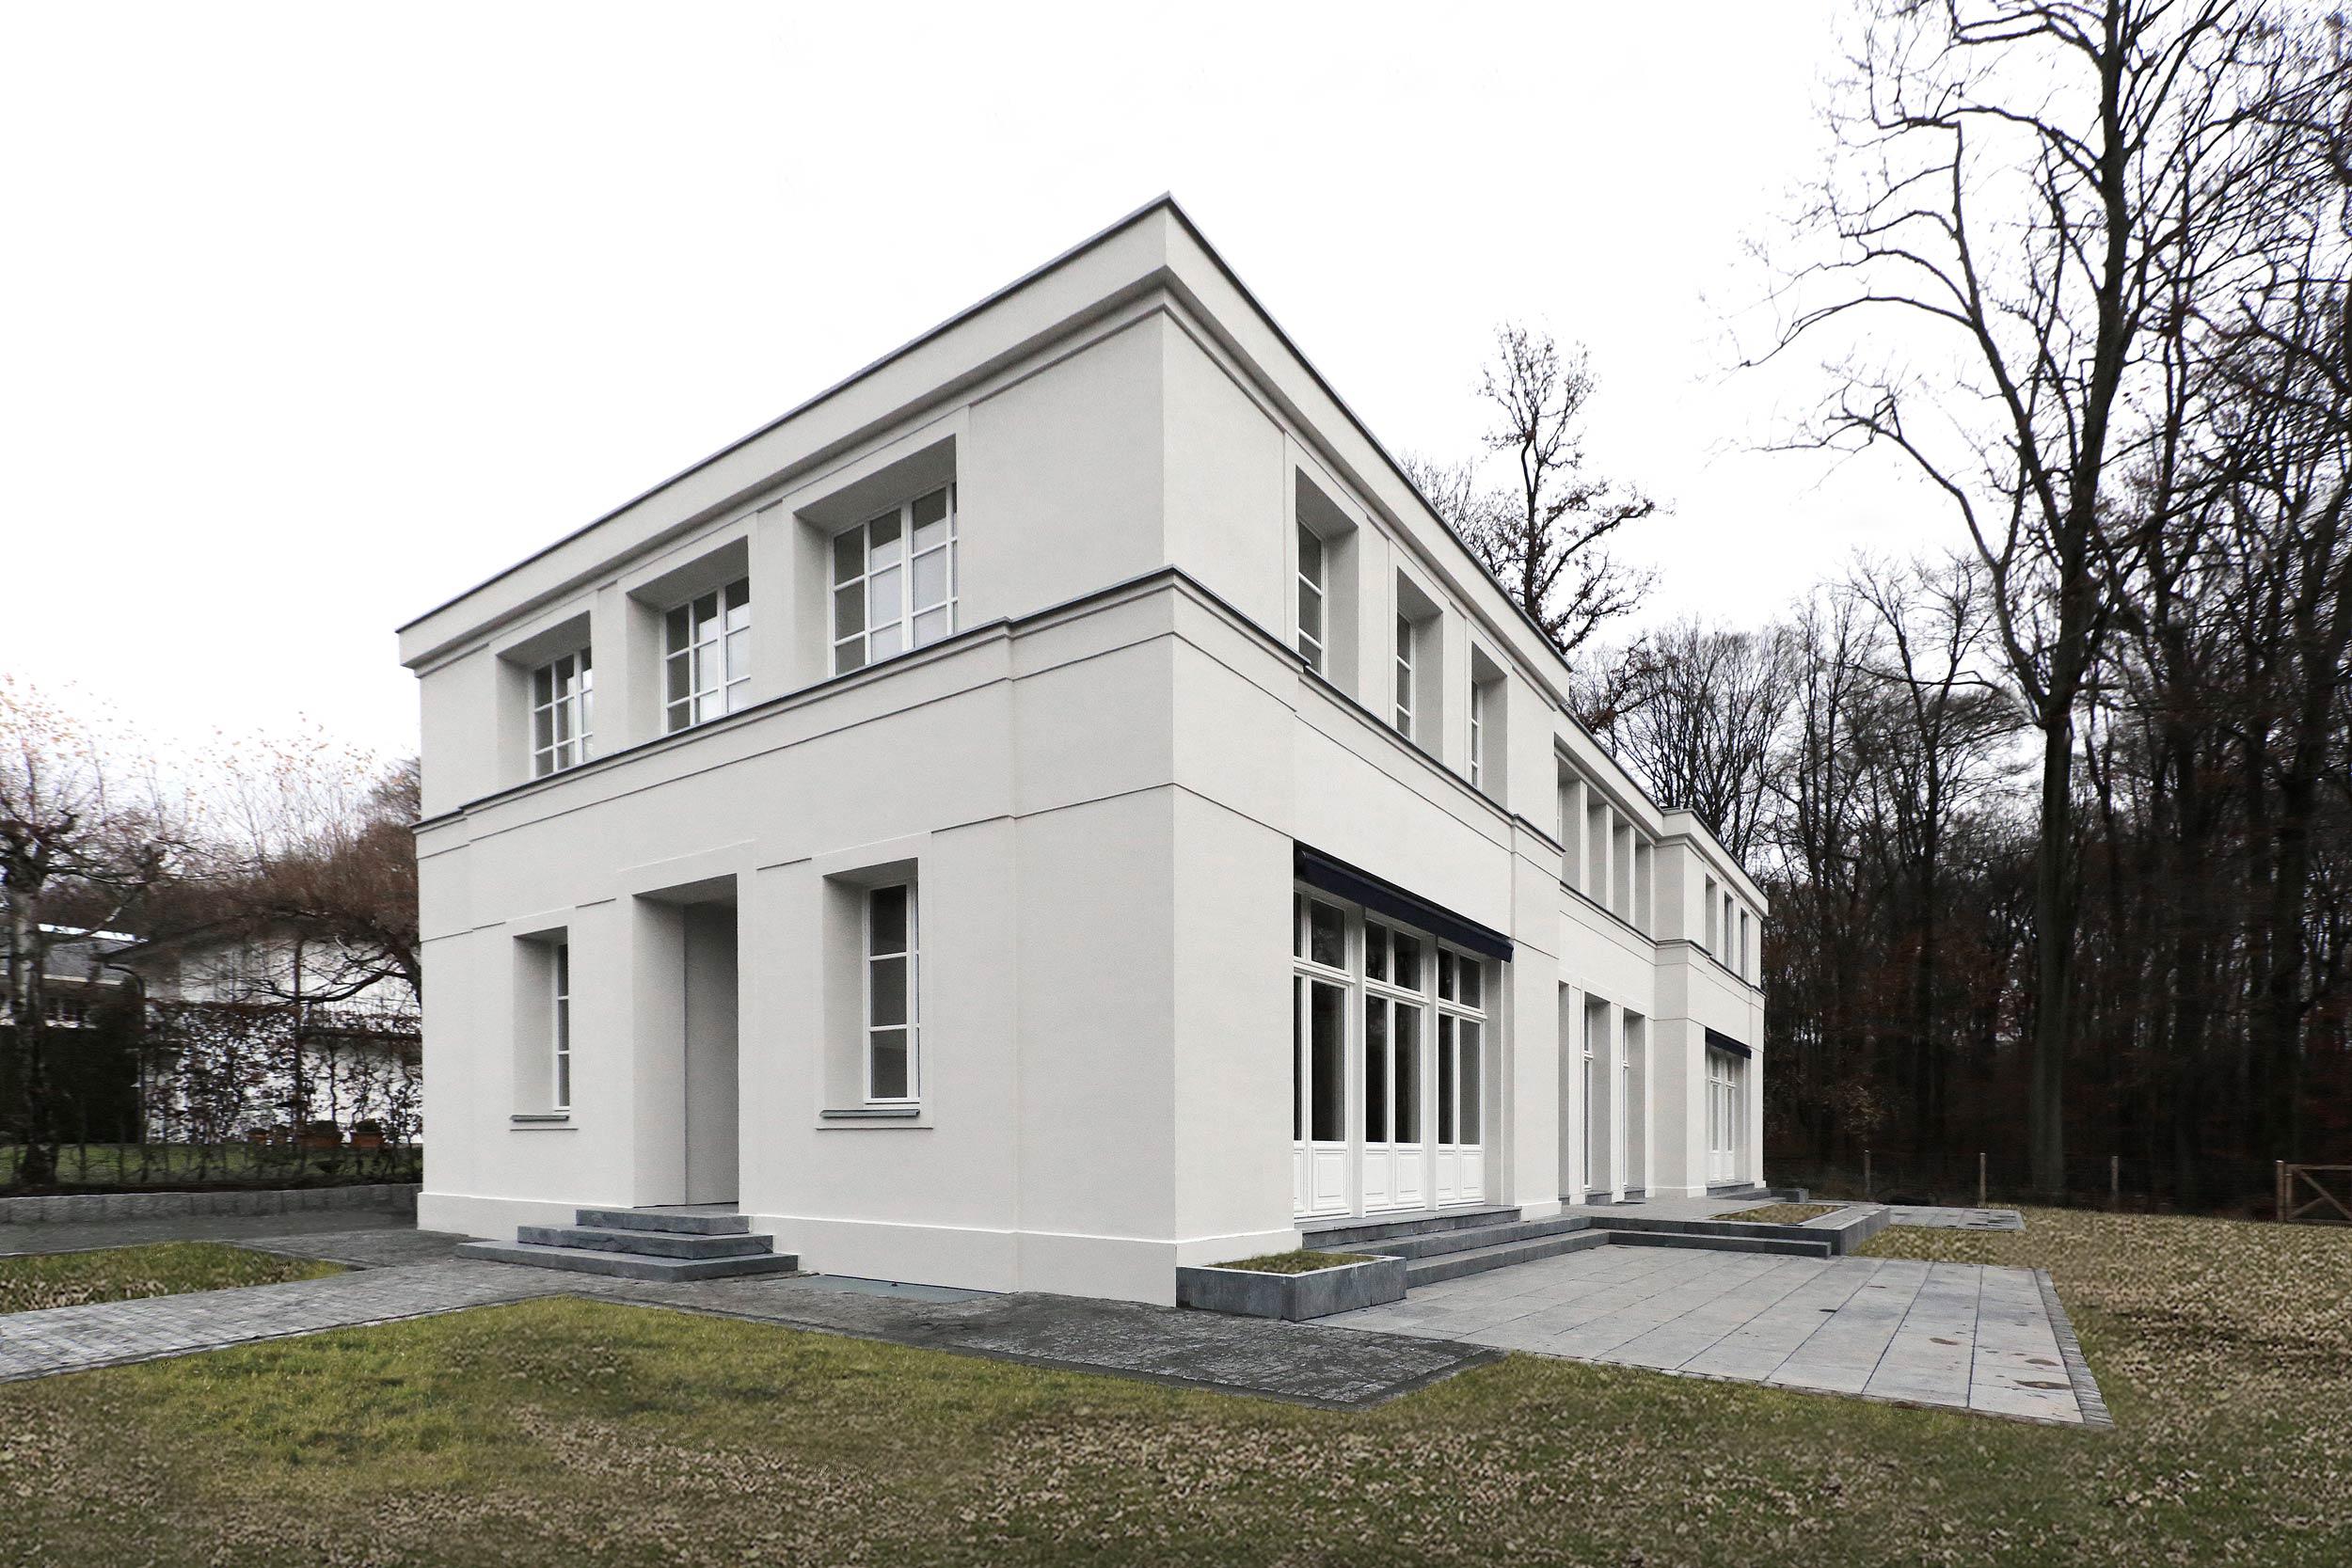 Klassische Villa Neubau mut zur symmetrie - neubau klassizistische villa - cg vogel